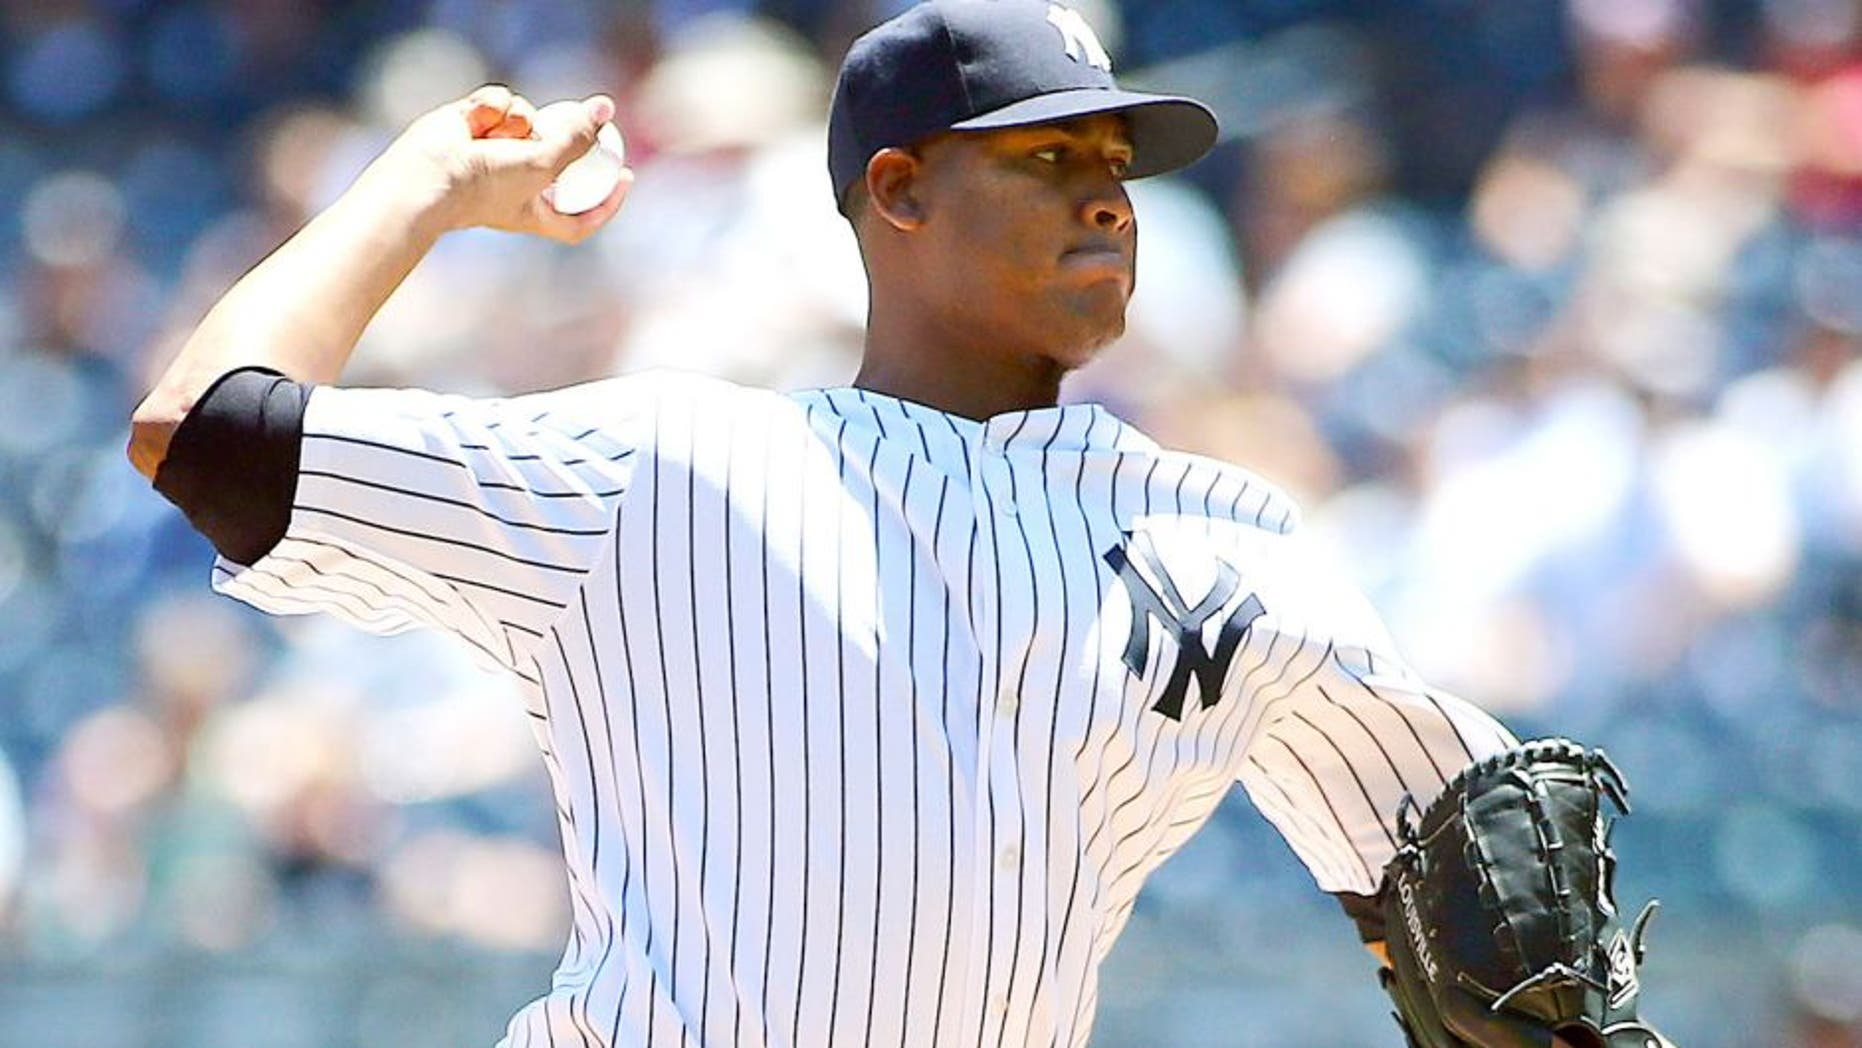 Jun 24, 2015; Bronx, NY, USA; New York Yankees starting pitcher Ivan Nova (47) throws a pitch against the Philadelphia Phillies at Yankee Stadium. Mandatory Credit: Andy Marlin-USA TODAY Sports